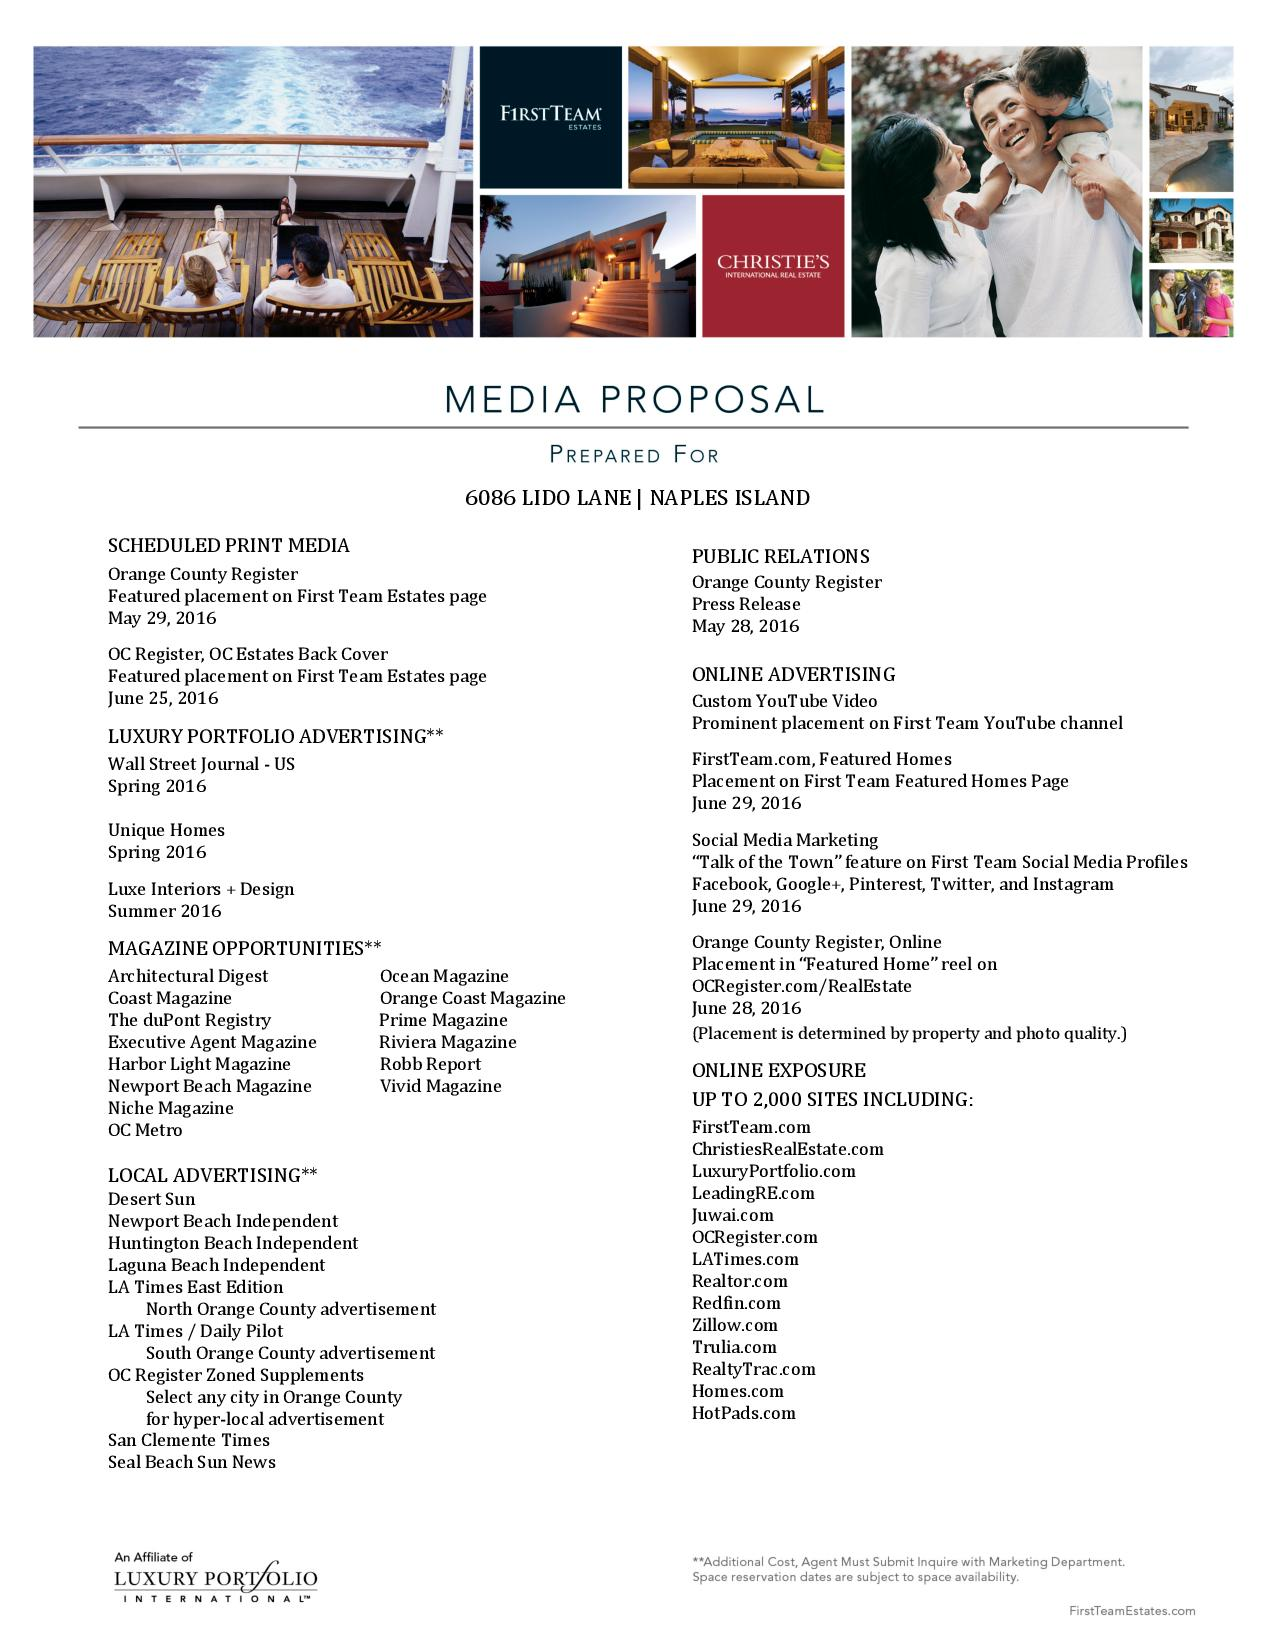 6086 Lido Lane Media Proposal